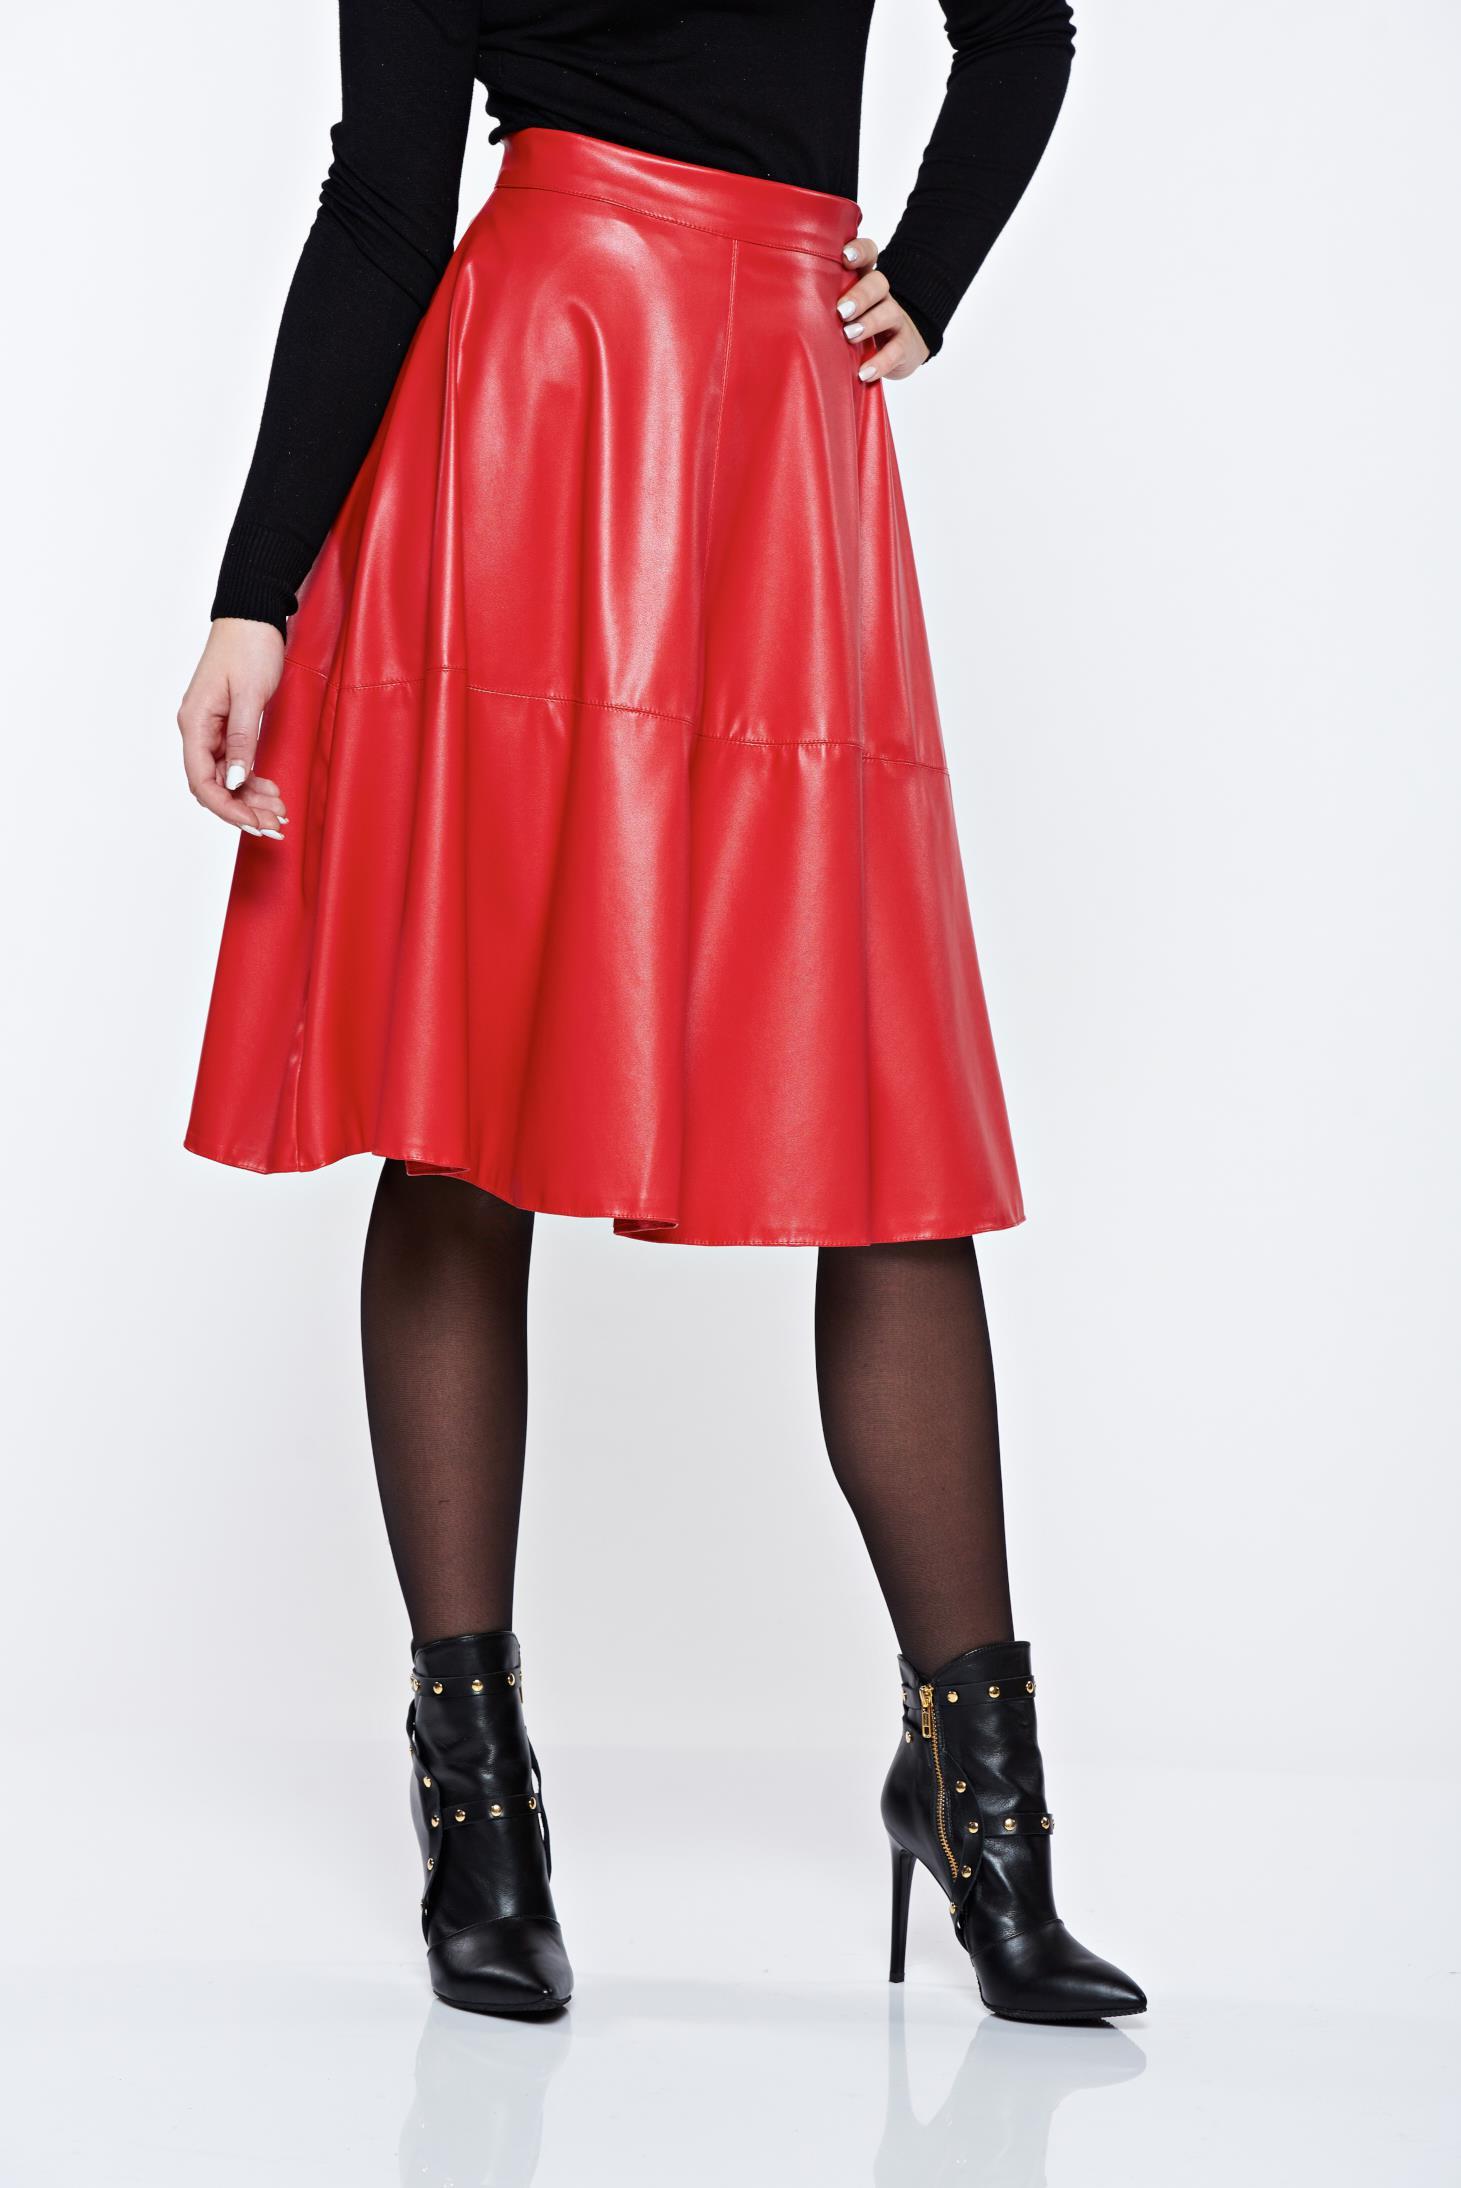 Piros StarShinerS casual magas derekú midi harang szoknya műbőrből